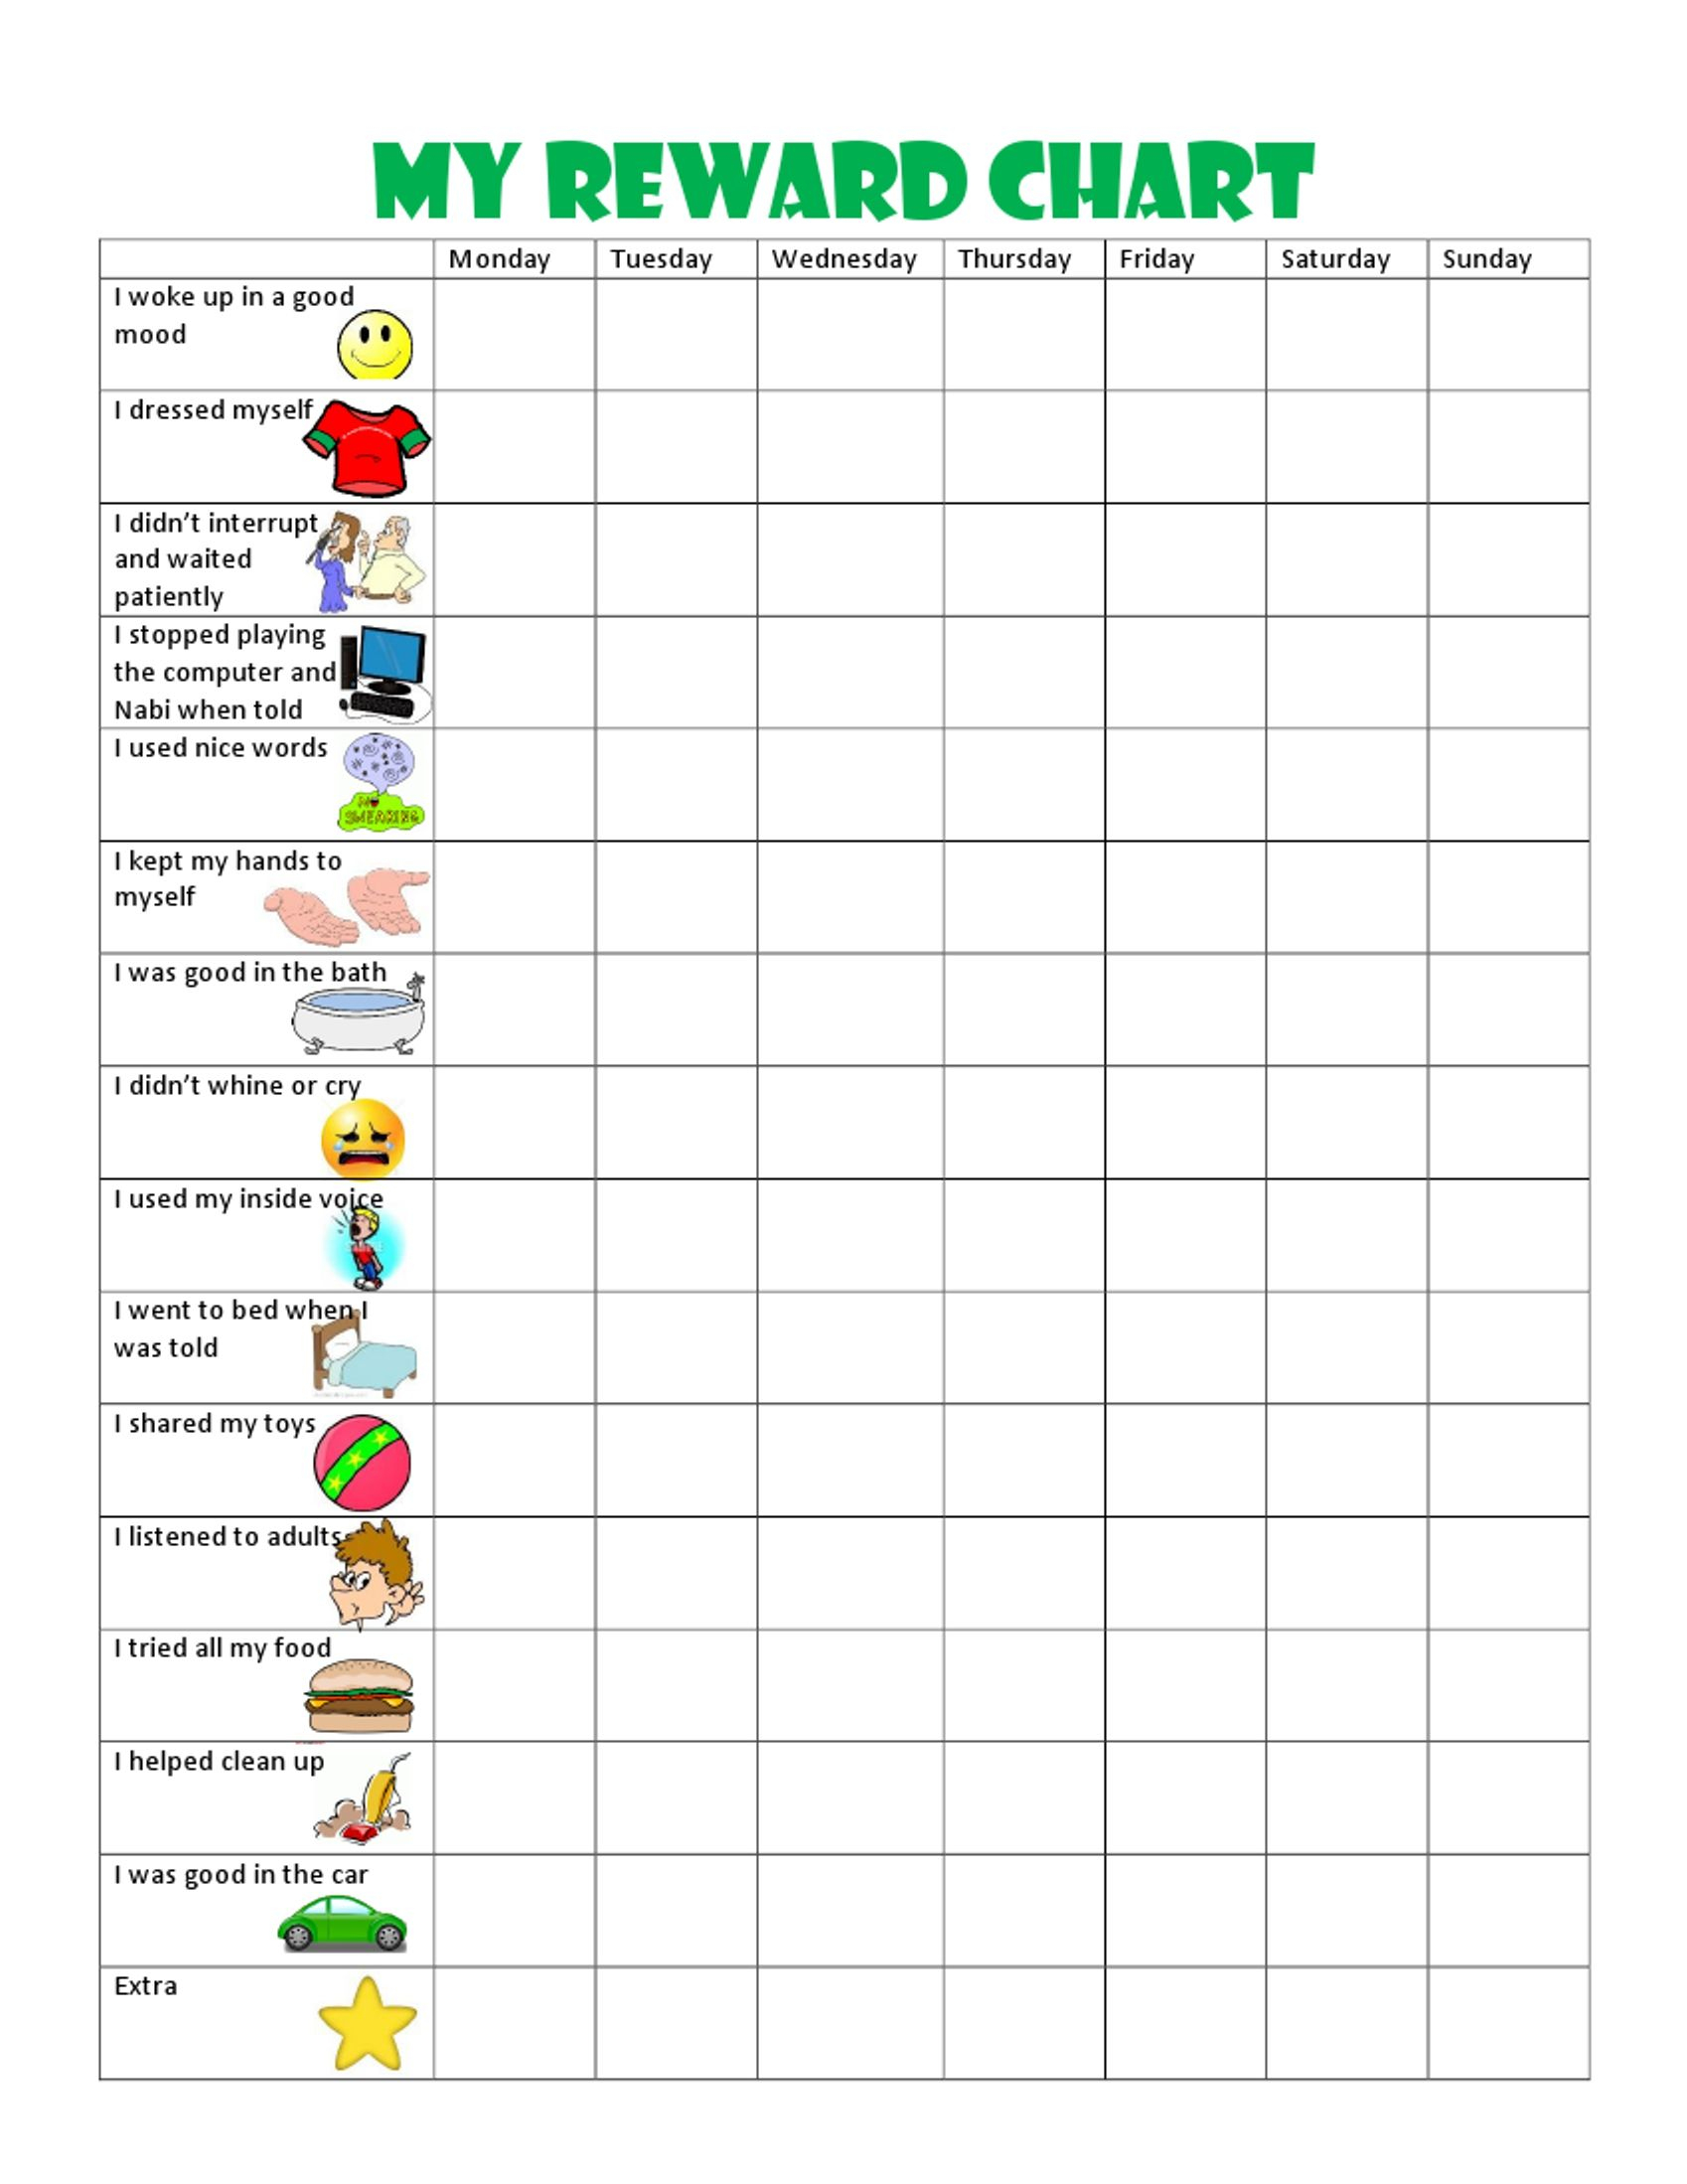 Image Result For Free Printable Behavior Charts For 6 Year Olds - Free Printable Behavior Charts